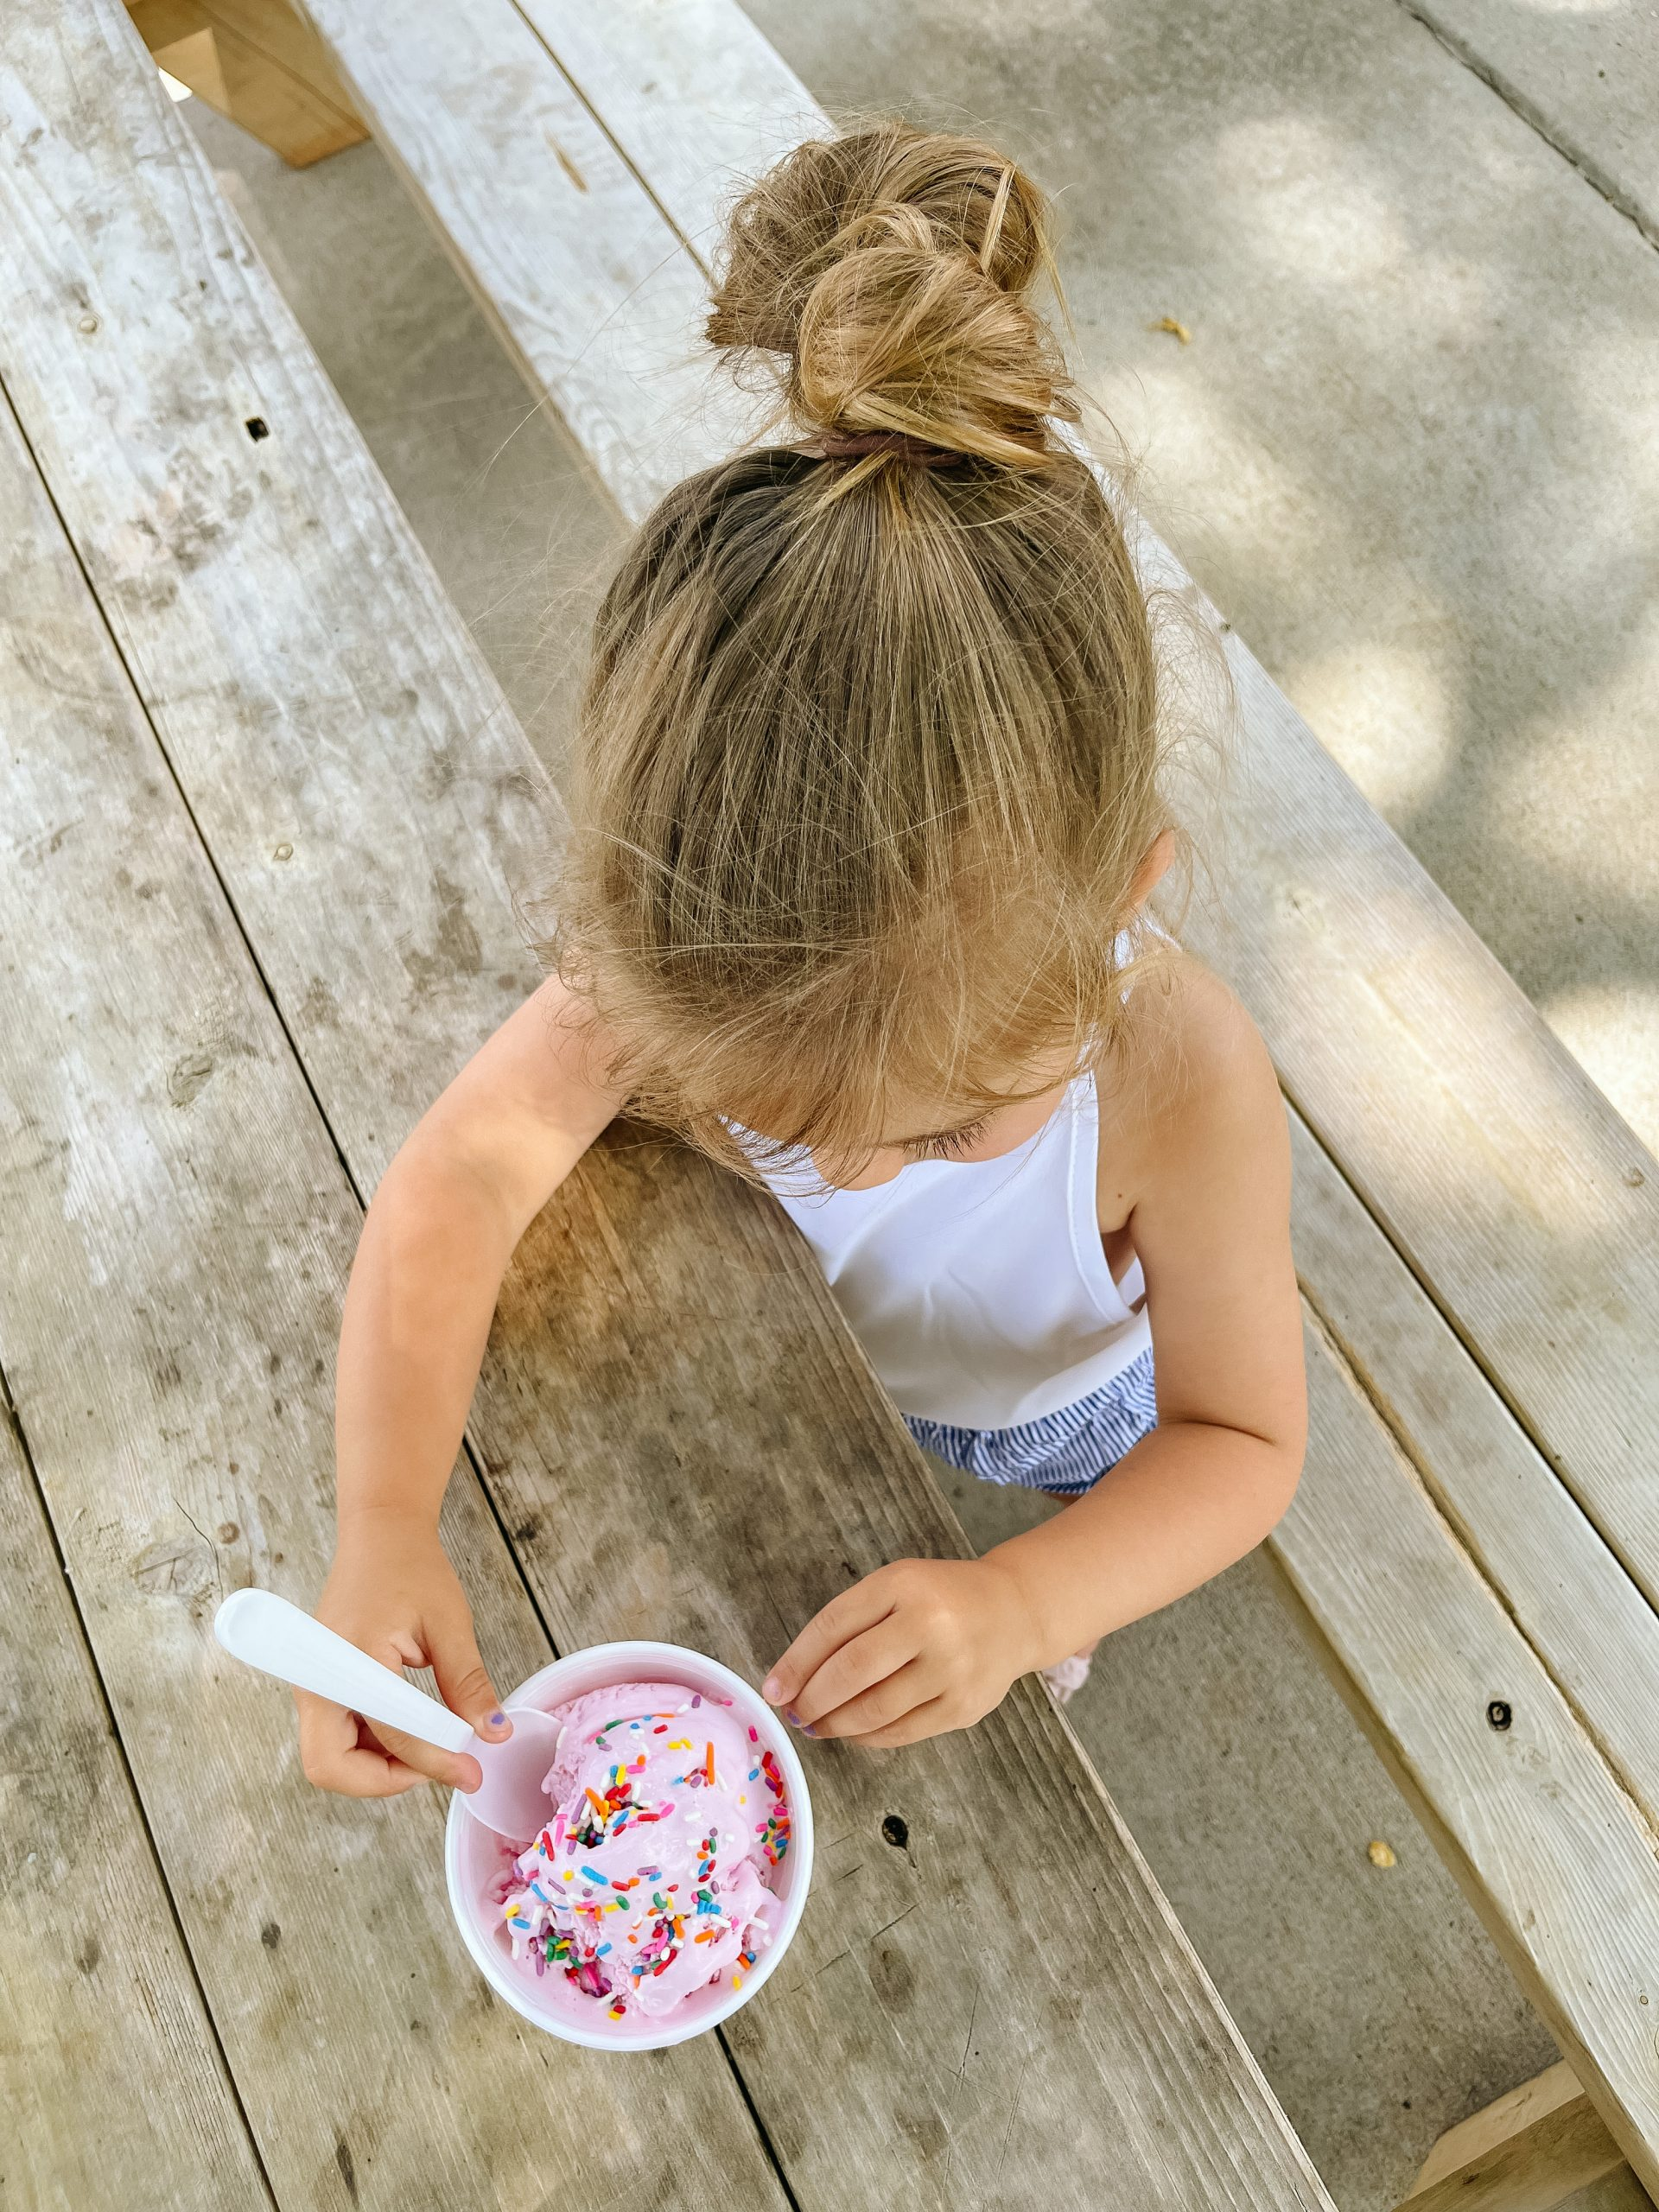 Nash Family Creamery Chapel Hill, TN MacKenlee Lanter pink ice cream sprinkles amazon 3T outfit Angela Lanter